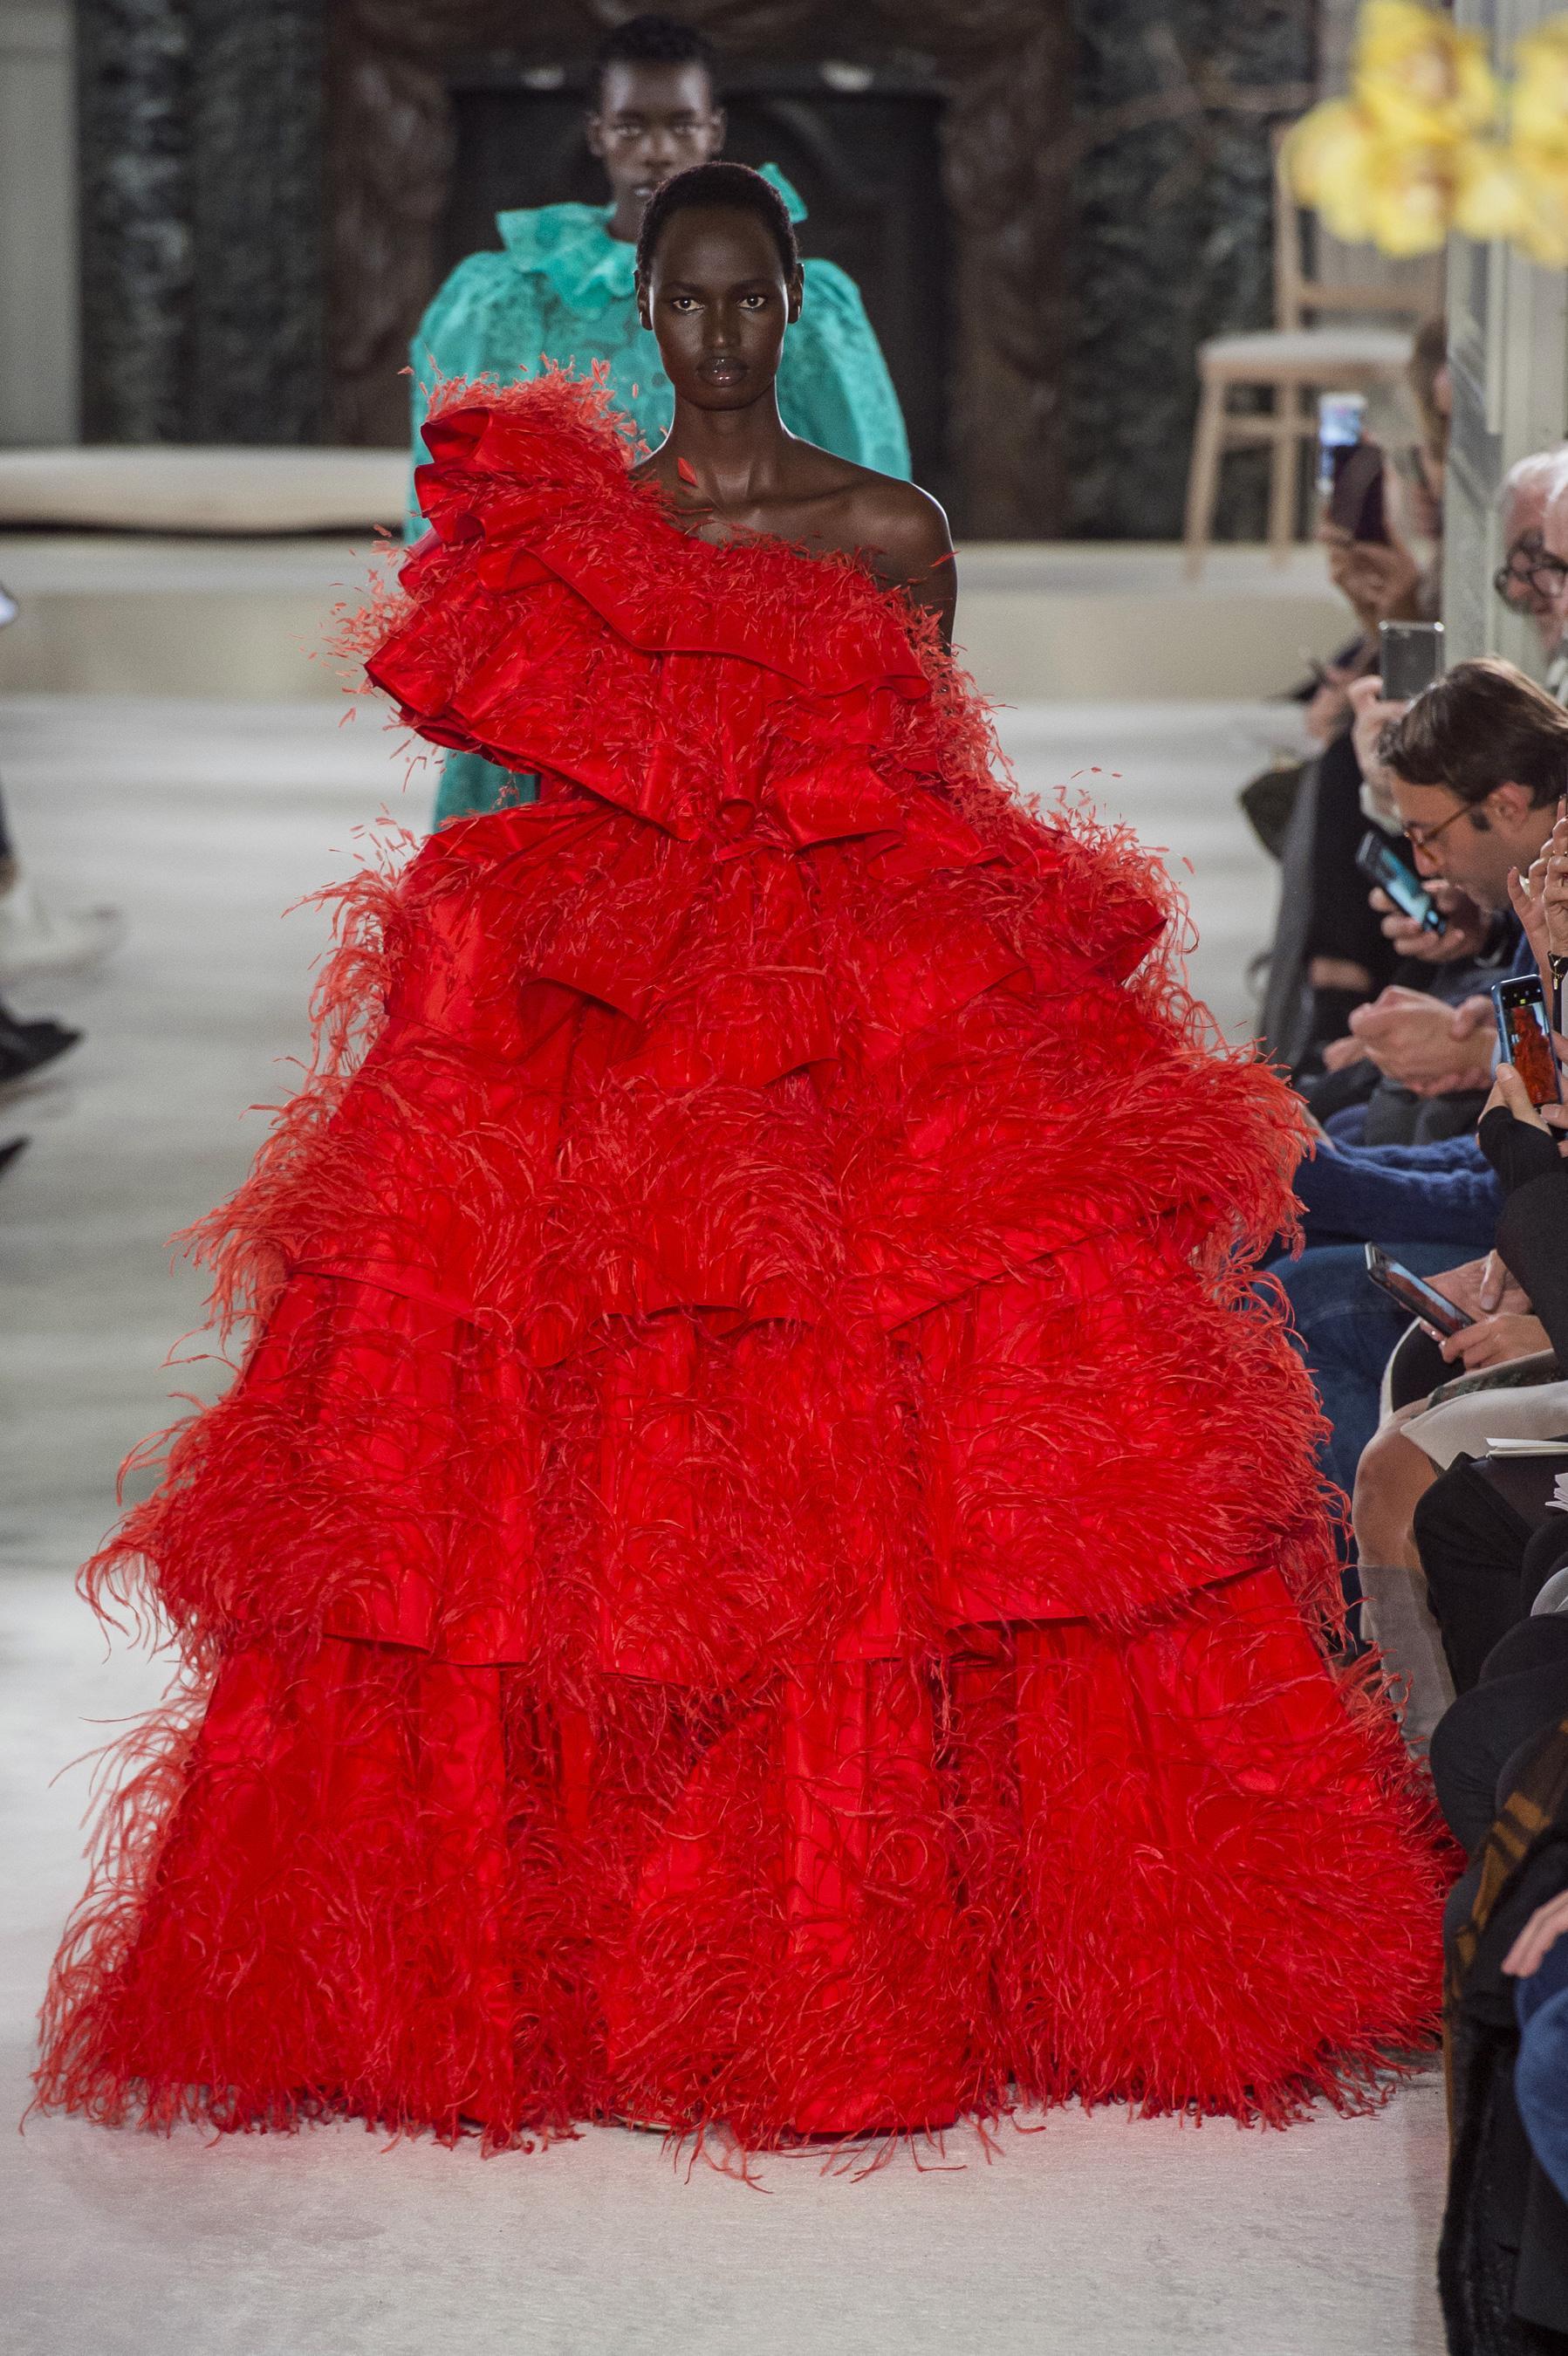 Figaro Printemps Défilé Valentino Été Couture Madame 2019 XTlOiPkwuZ